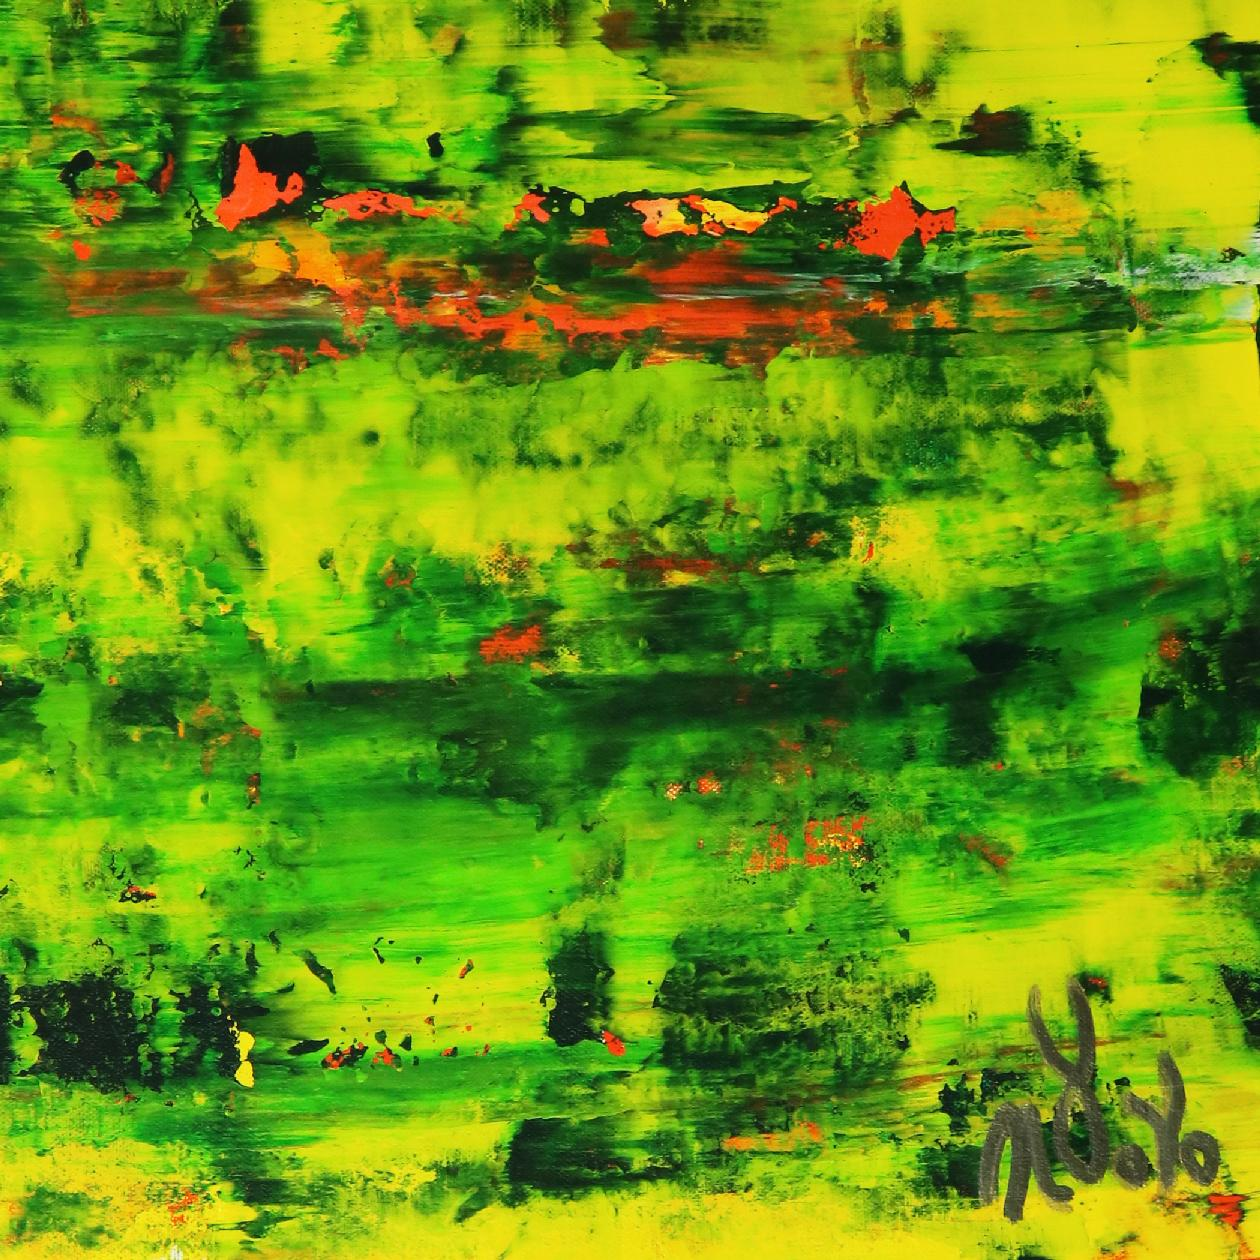 signature - Sunny Morning Panorama 4 (2020) by Nestor Toro